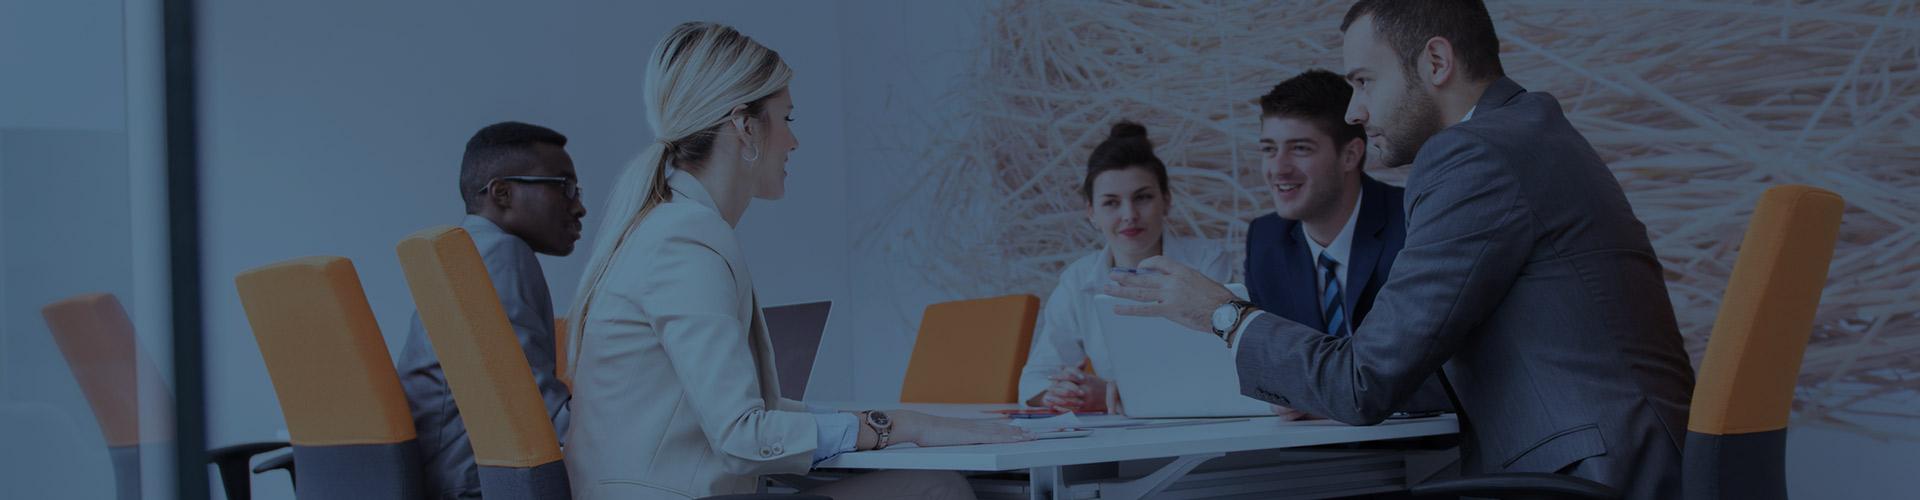 Move Training for Customer Staff